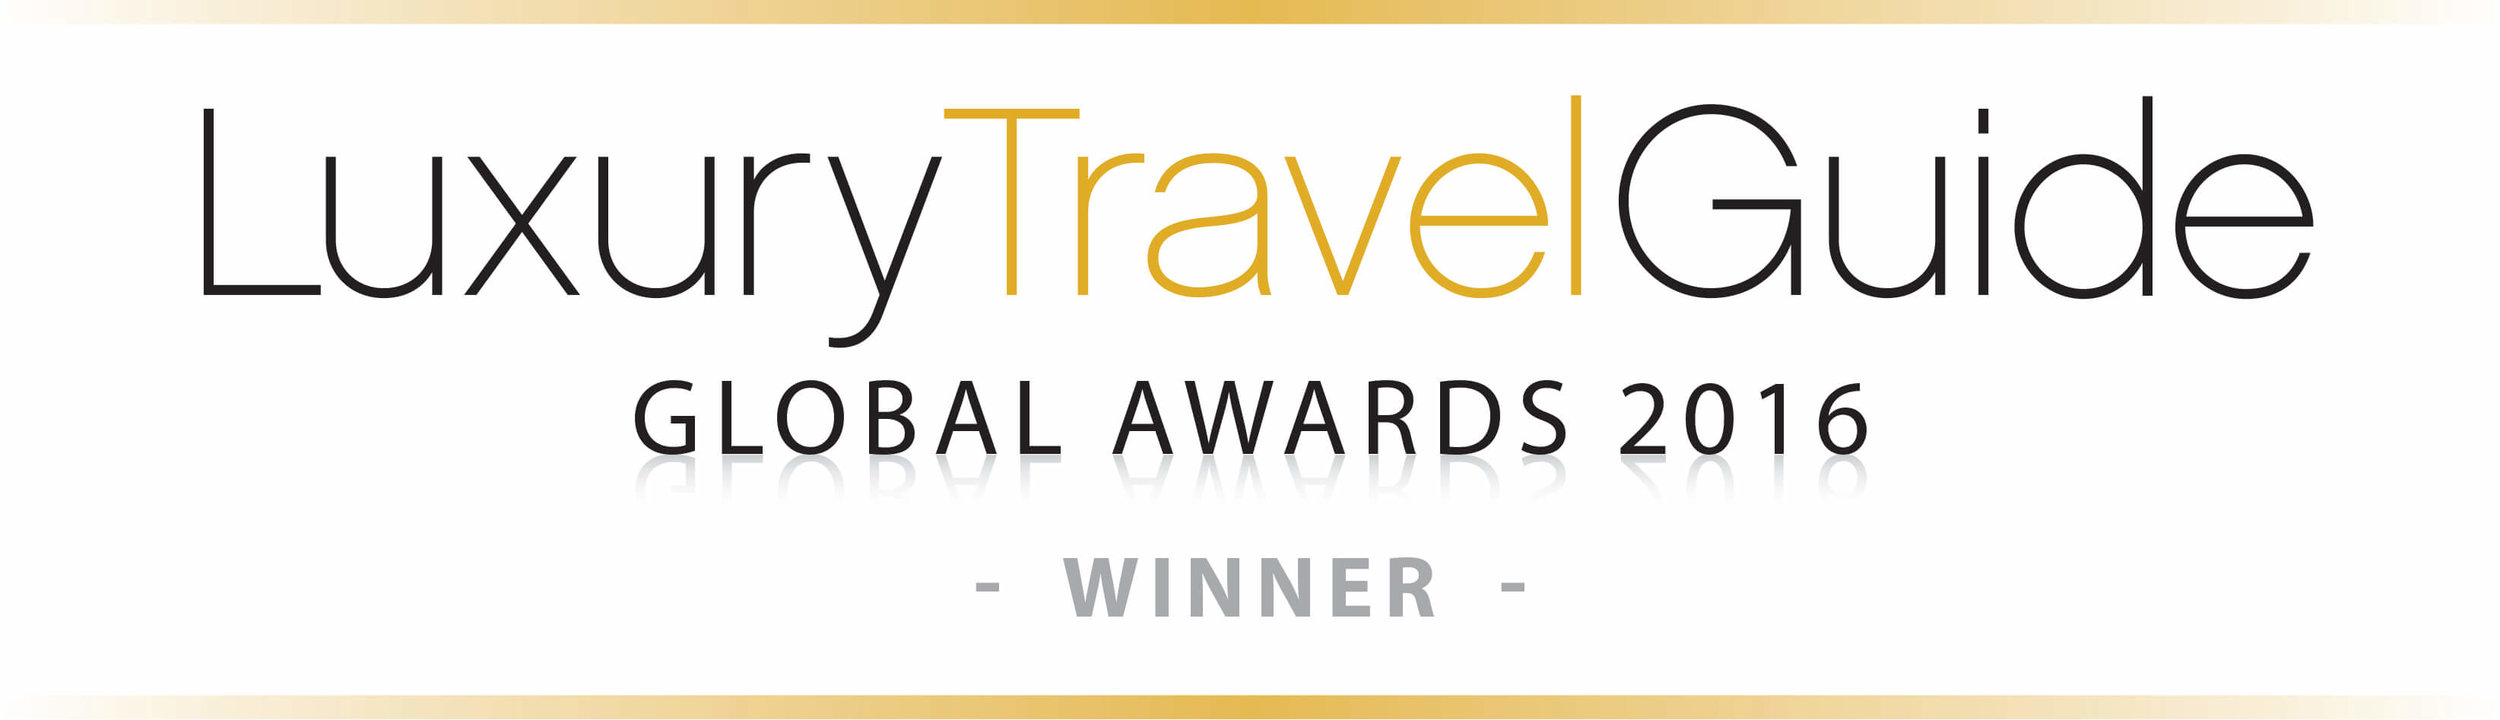 Luxury Travel Guide Global Awards Roatan Divers